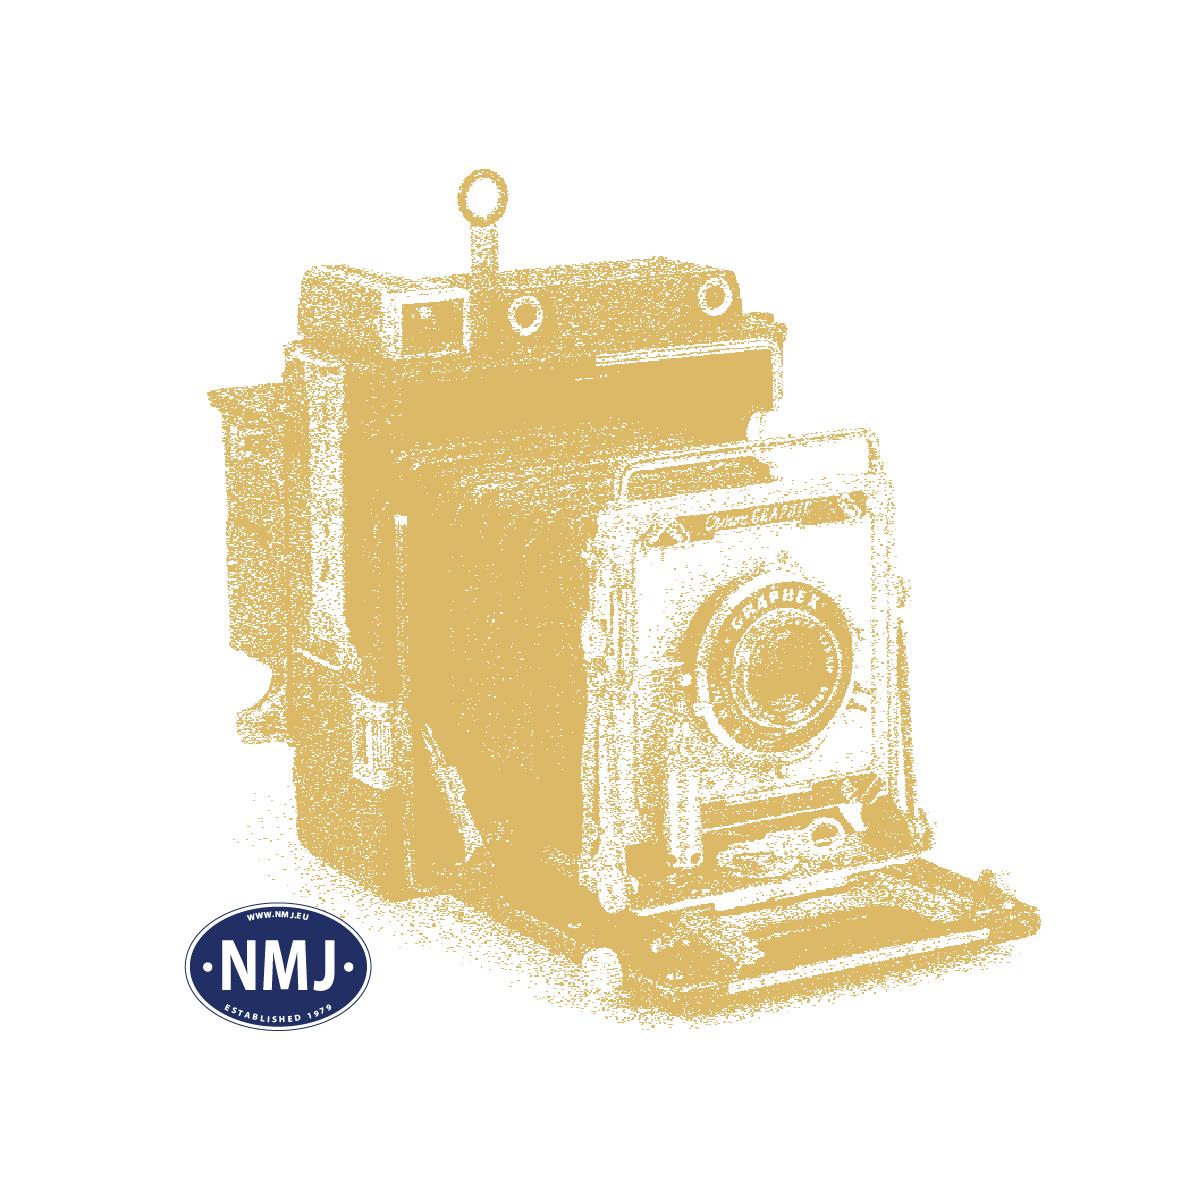 NMJT94008 - NMJ Topline SJ Y1 1366, Inter-Regio, DCC m/ Lyd